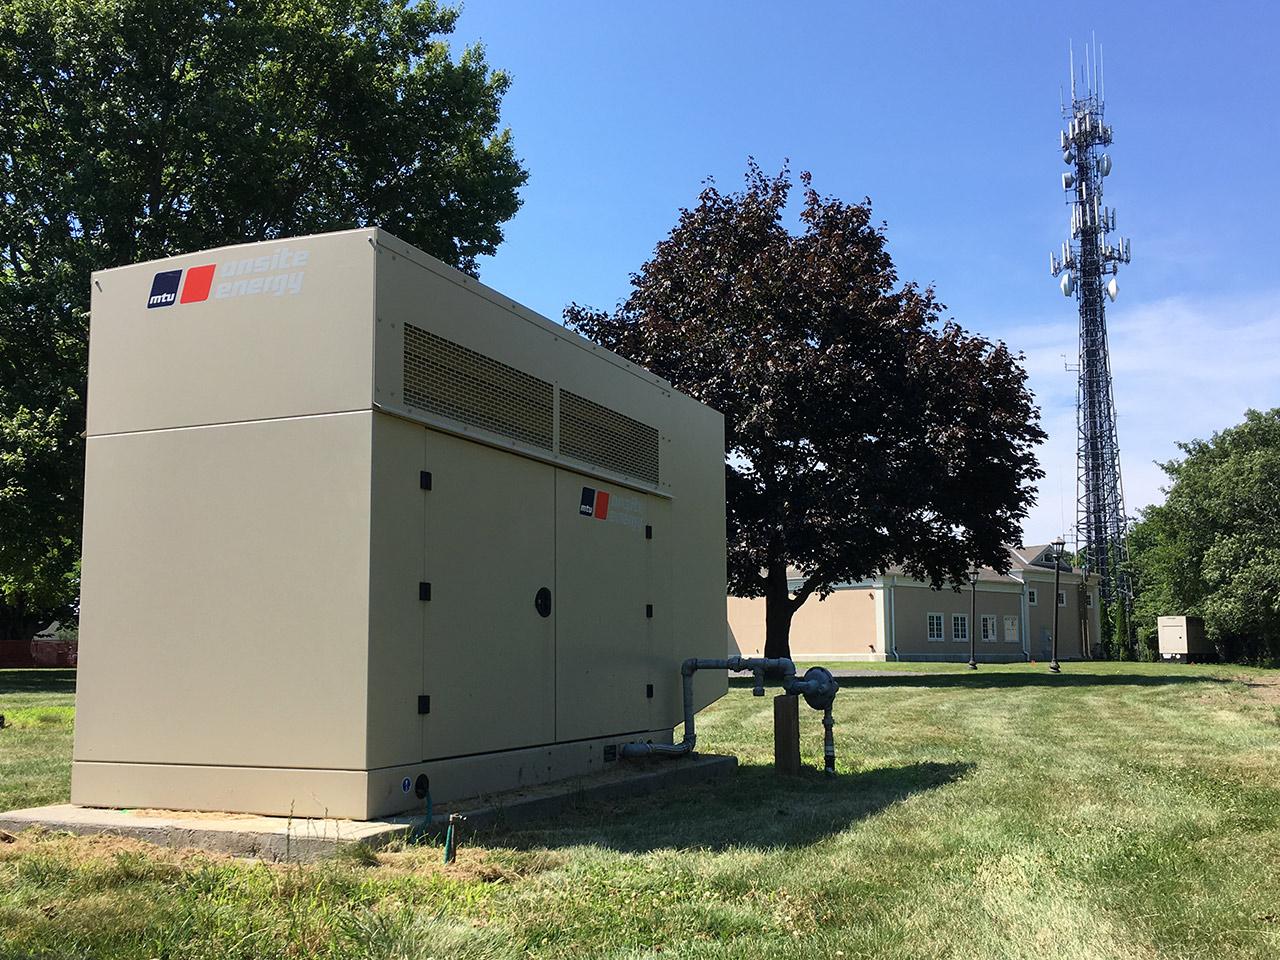 Emergency Generators for Peak Power Periods | The East Hampton Star